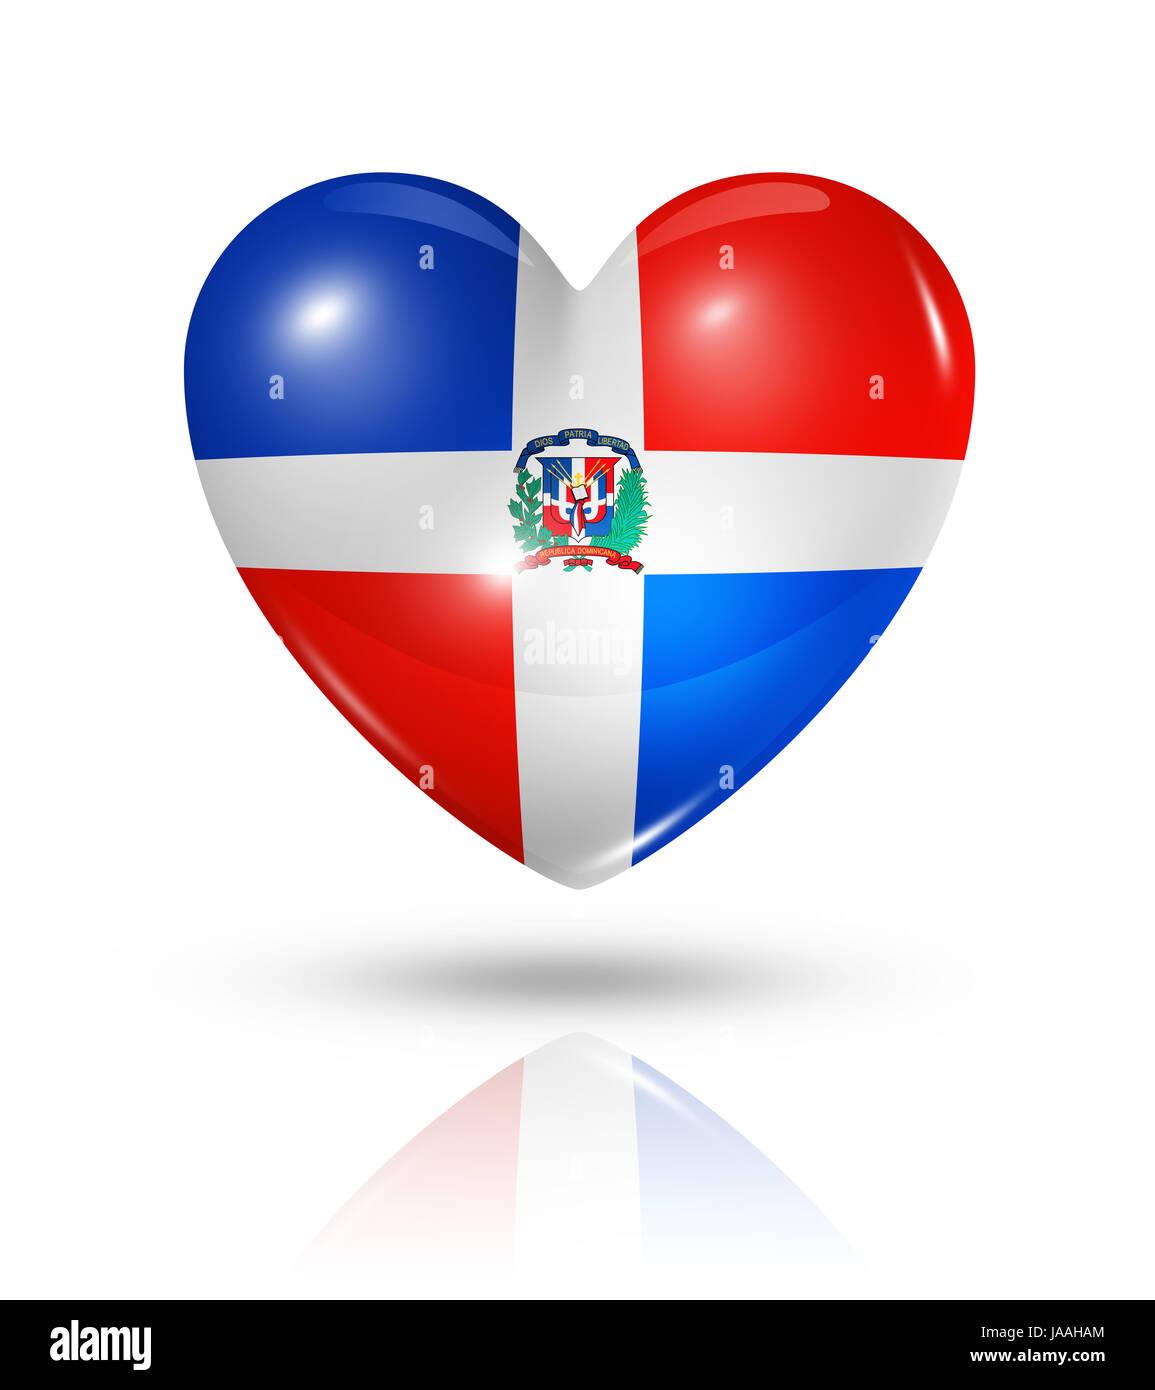 Flag Love In Love Fell In Love Dominican Heart Pictogram Stock